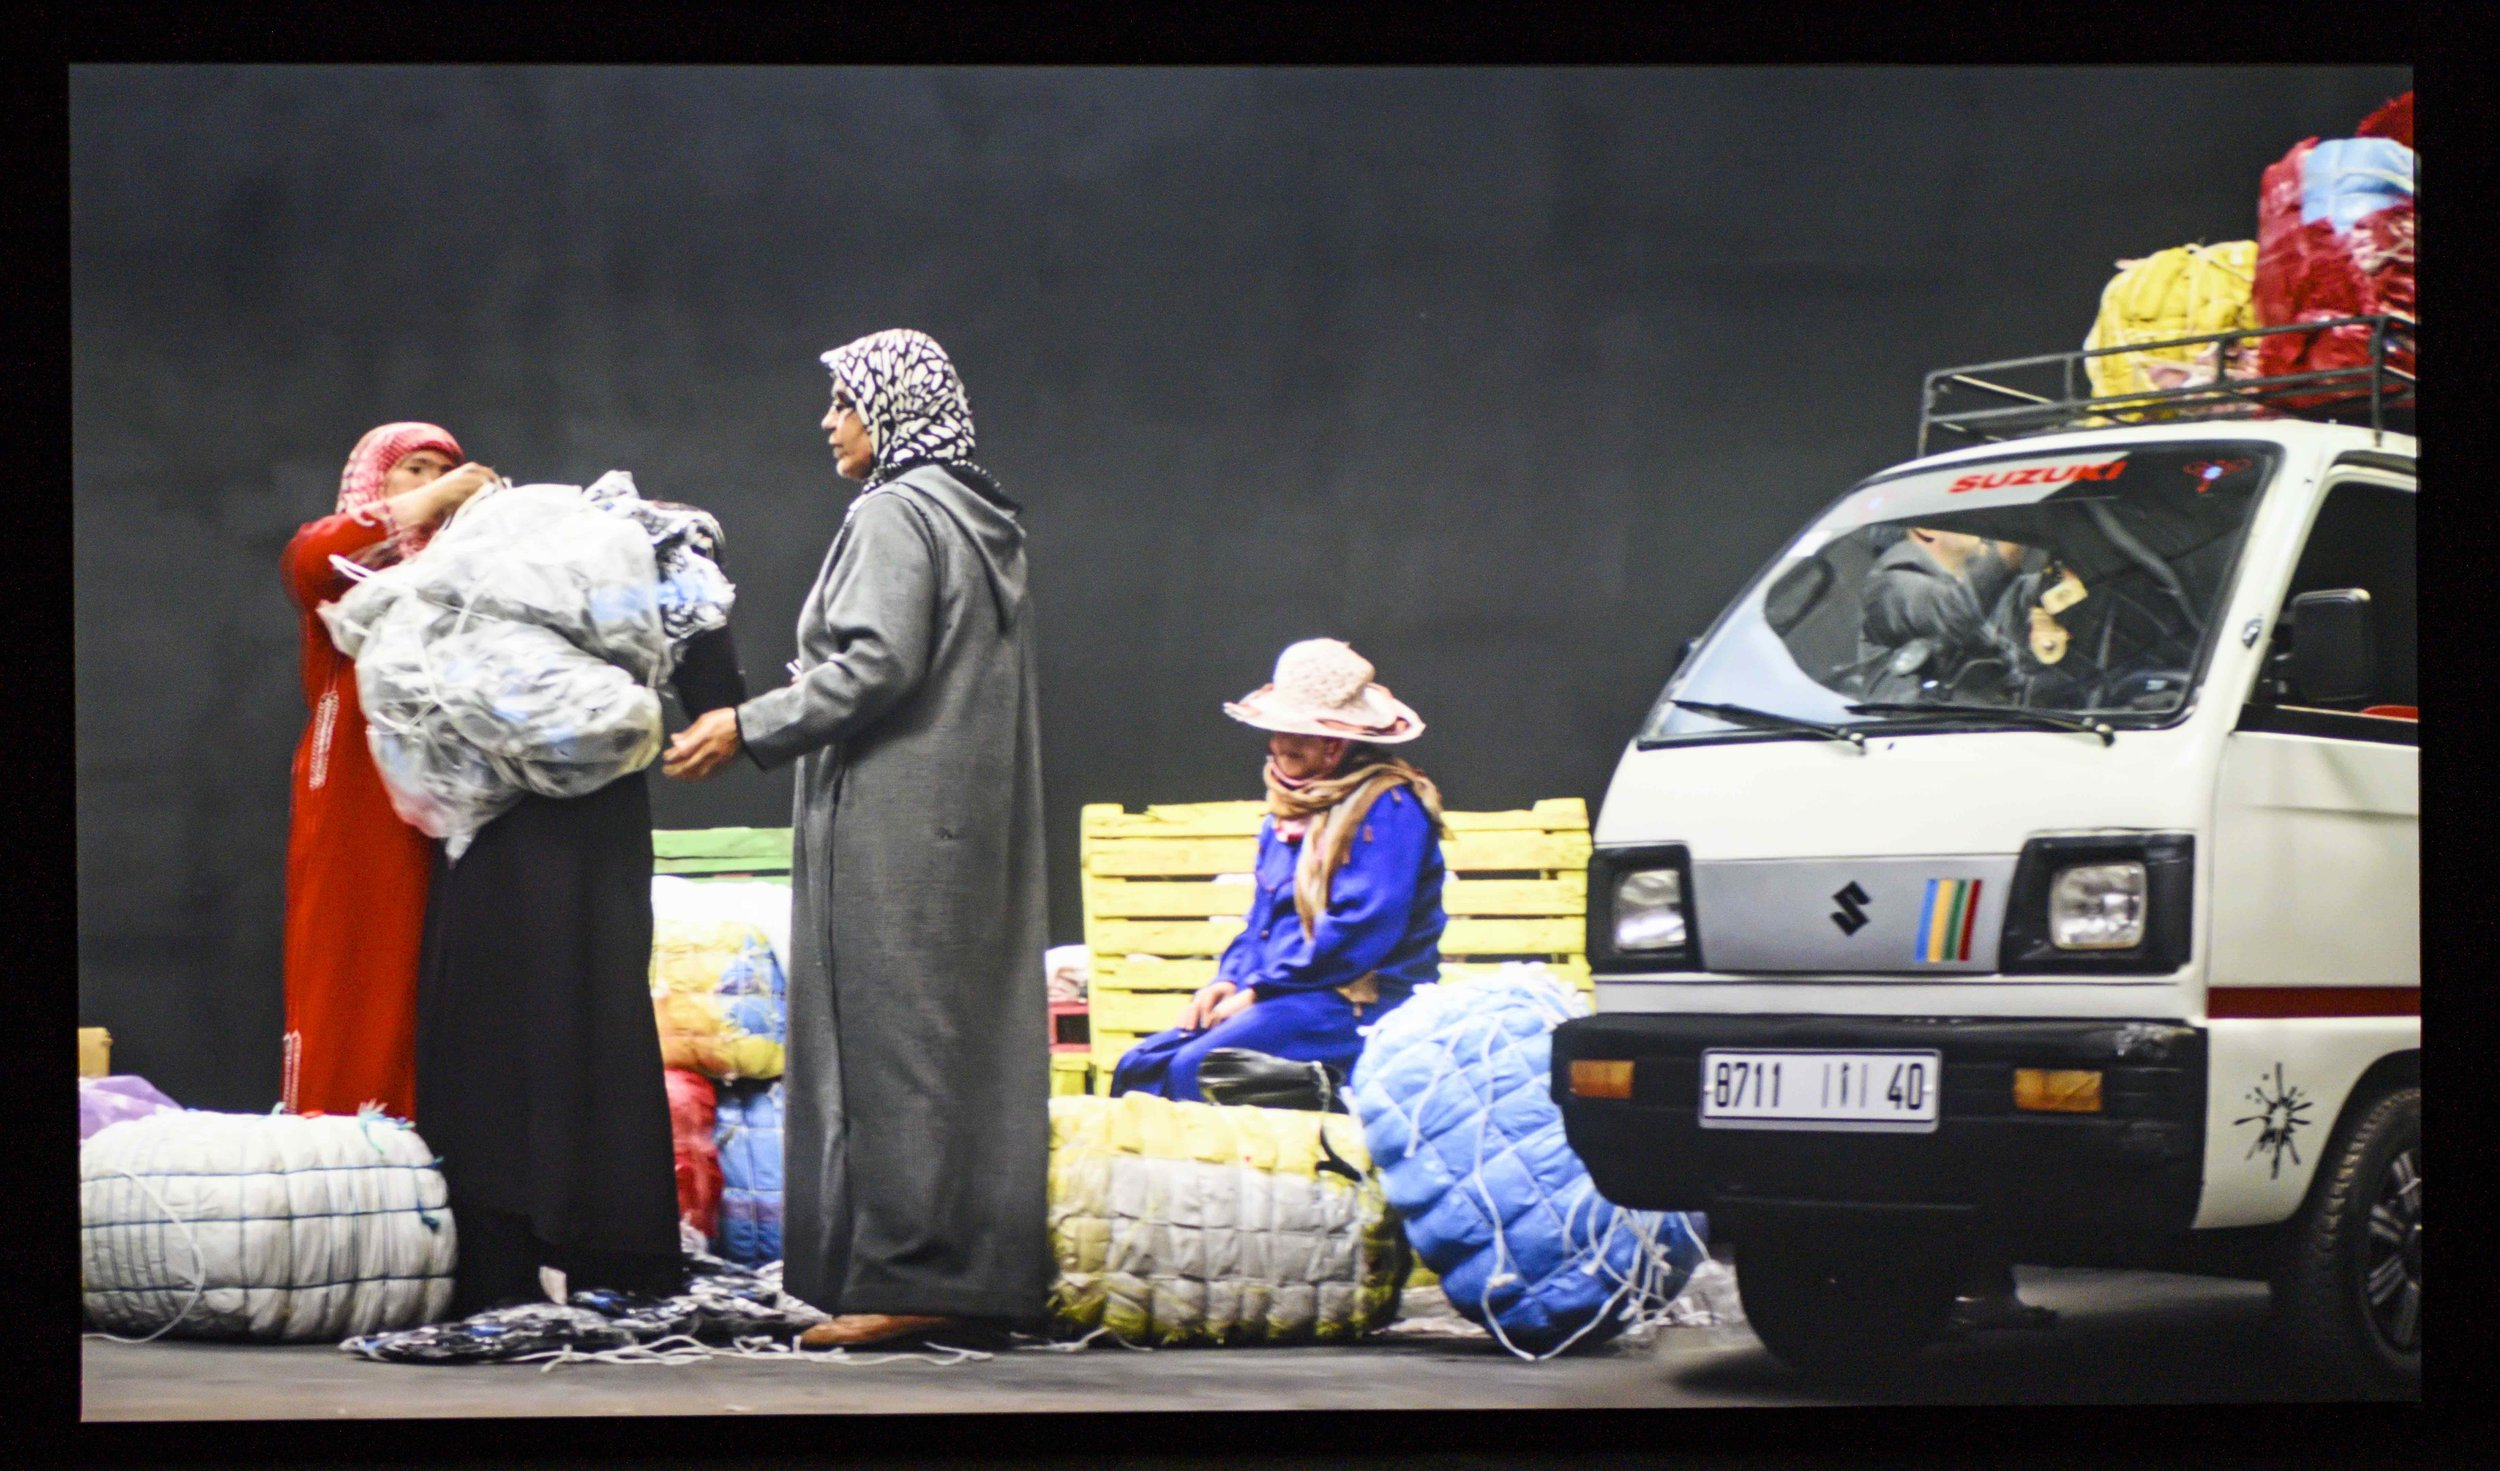 Randa Maroufi,  Bab Sebta,  2019. HD video; 19 minutes. Installation view:  SurfaceTension,  Sharjah Art Foundation, Sharjah, 2019. Courtesy of the artist. Barney Production -Montfleuri Production. Photo: Sharjah Art Foundation